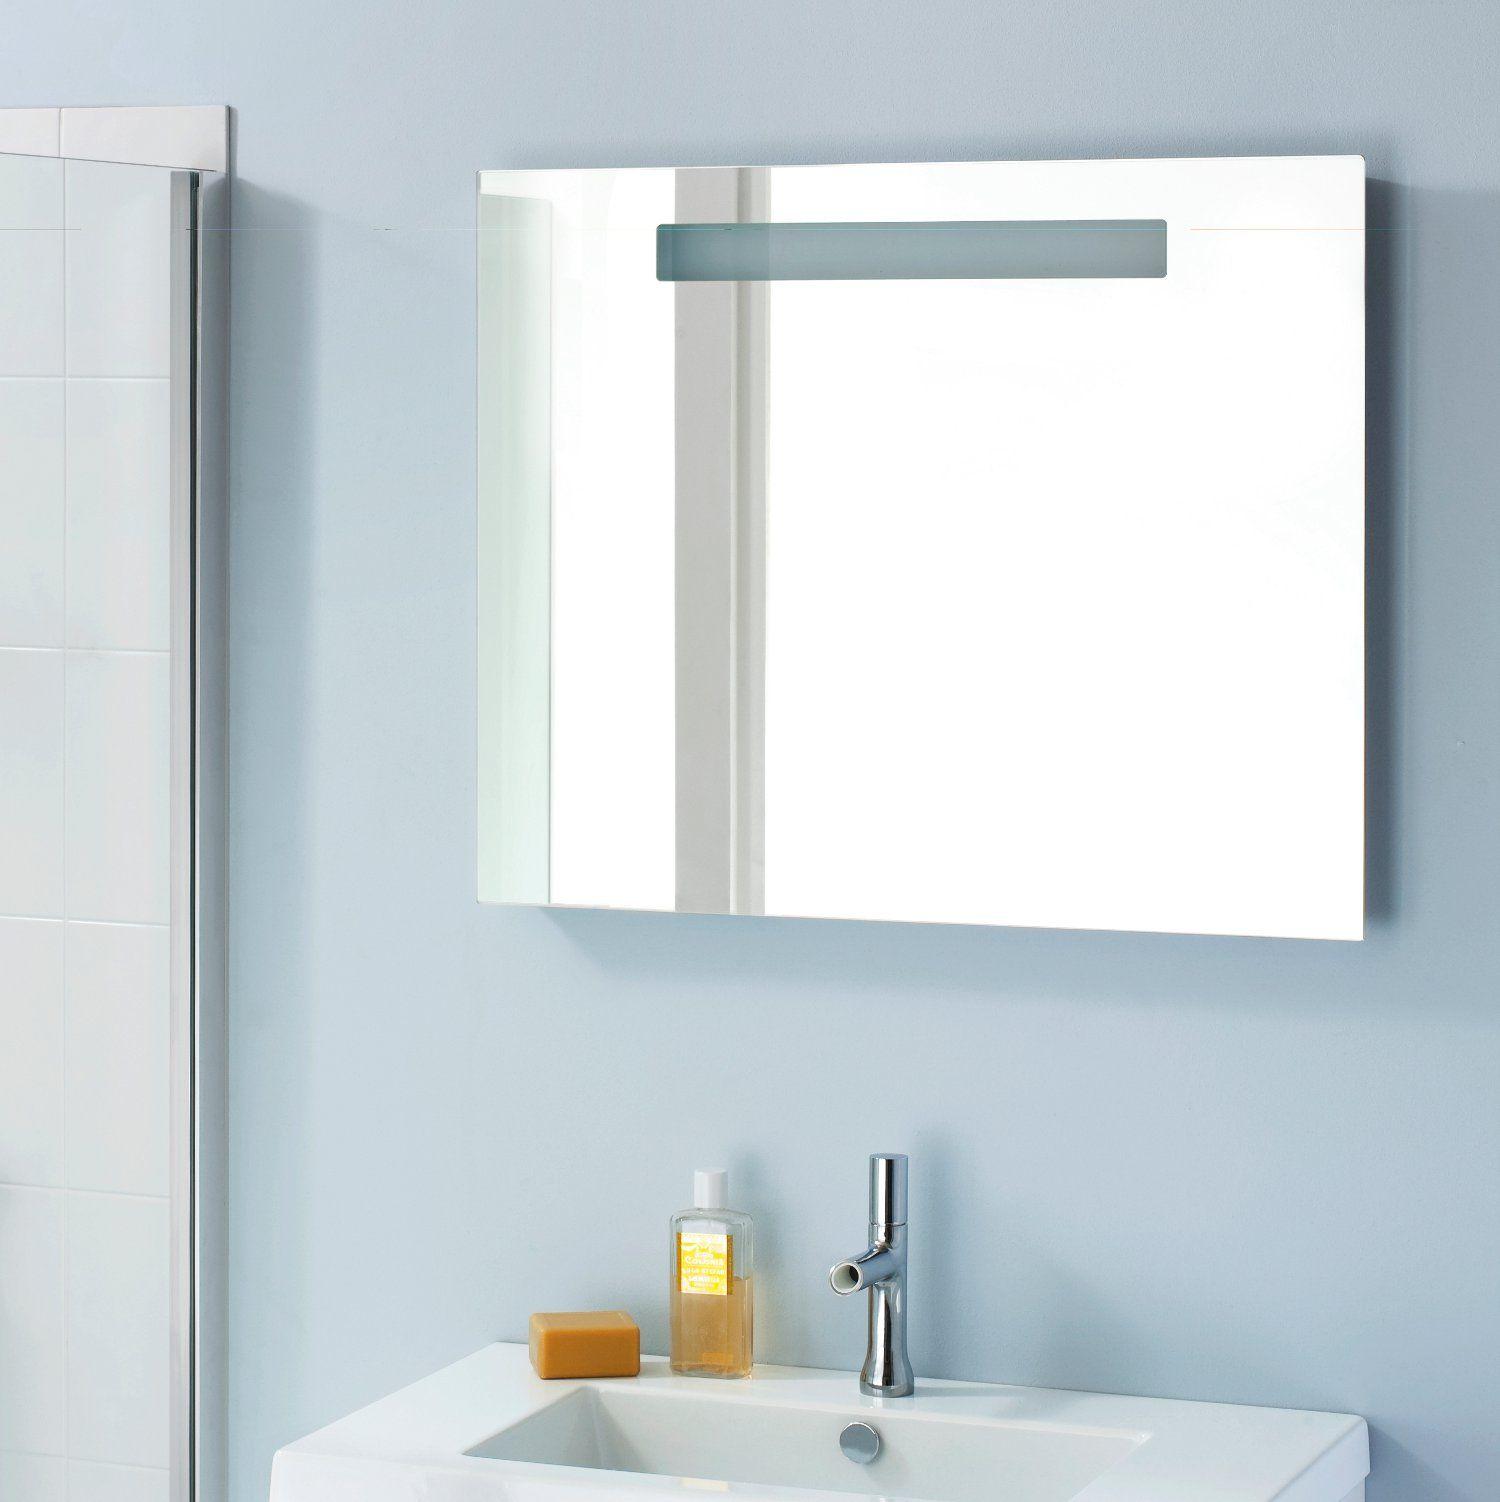 Miroir salle de bain r tro clairage led sanijura http for Miroir salle de bain retro